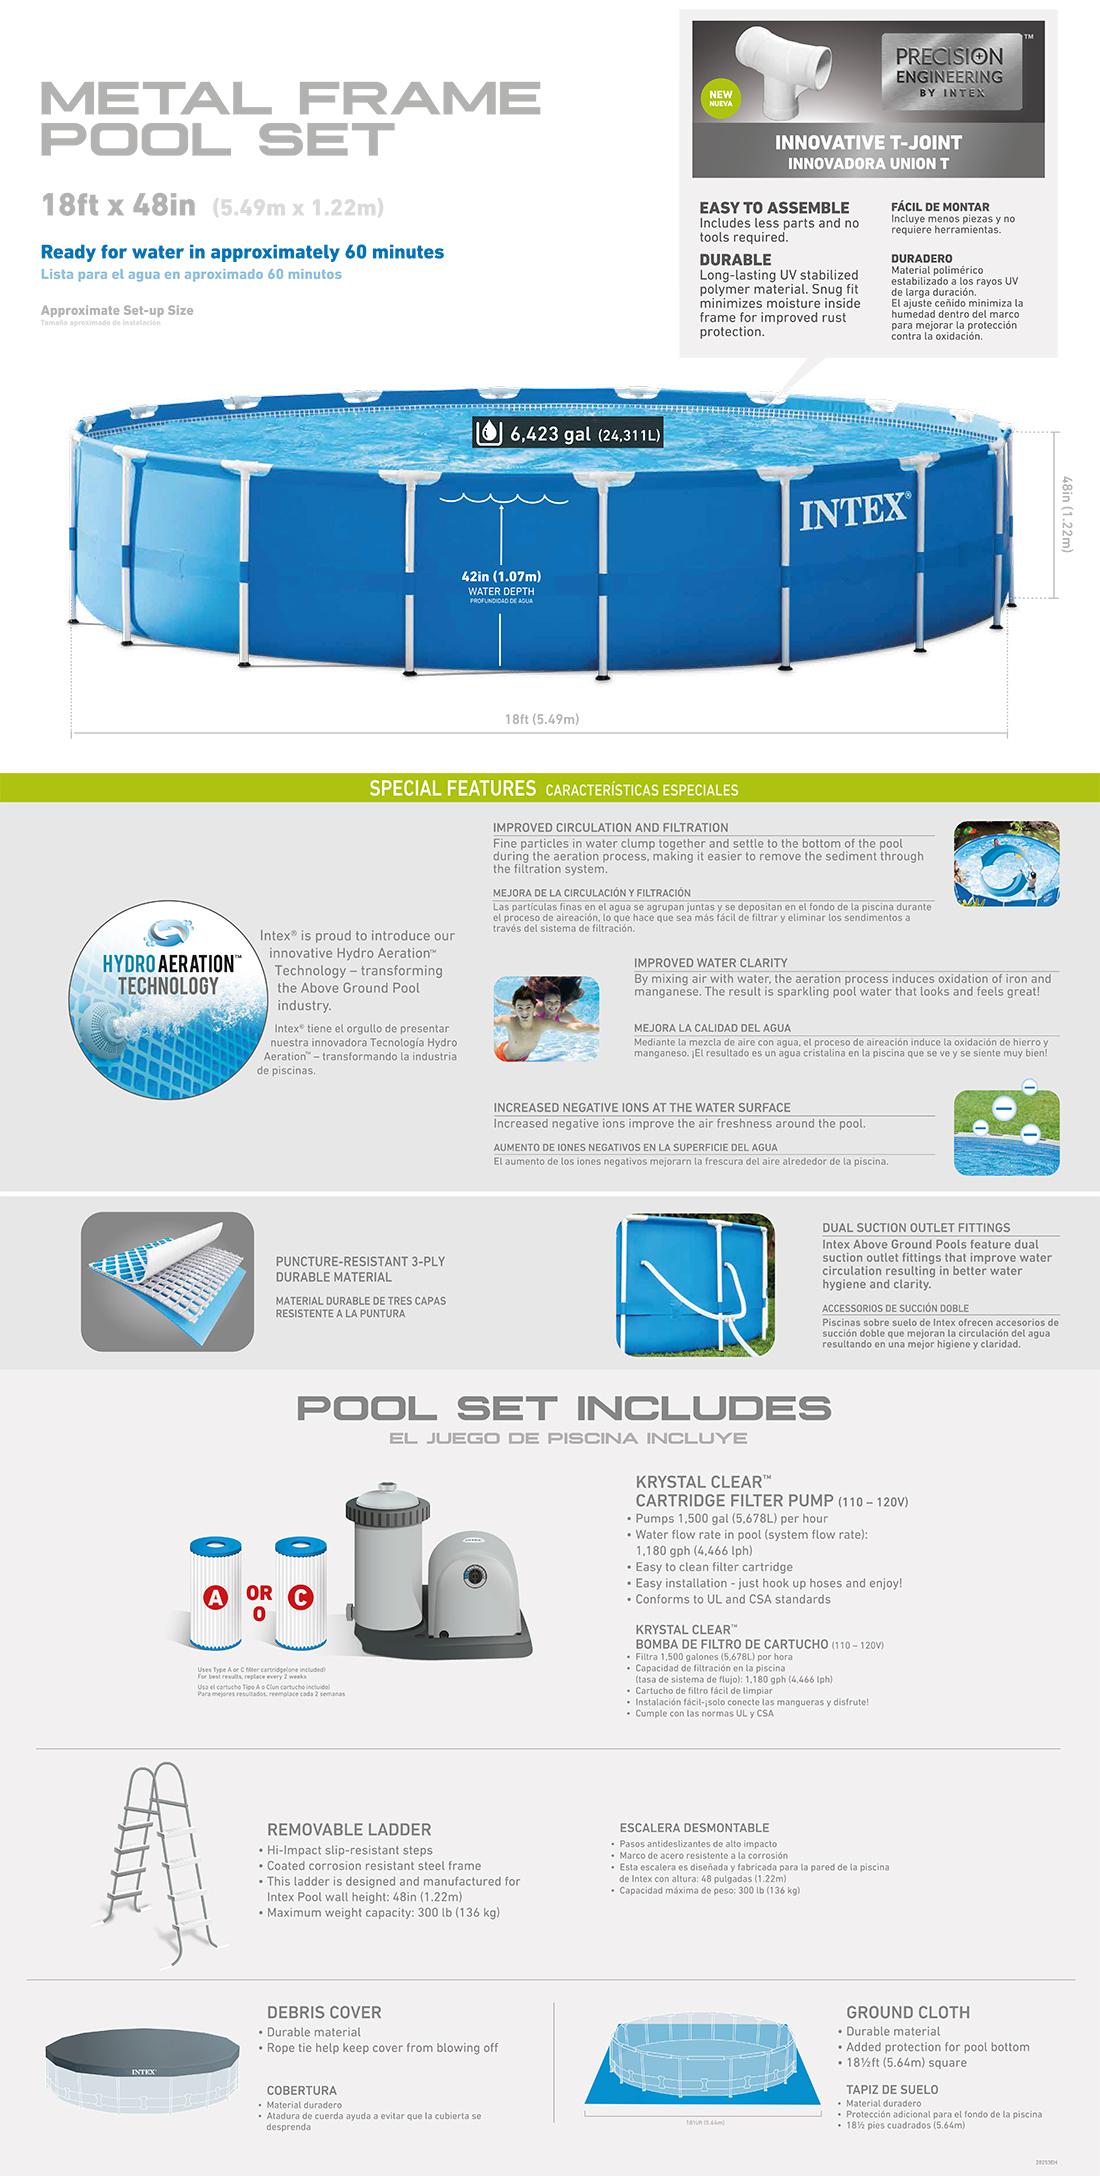 18ft X 48in Metal Frame Pool Set